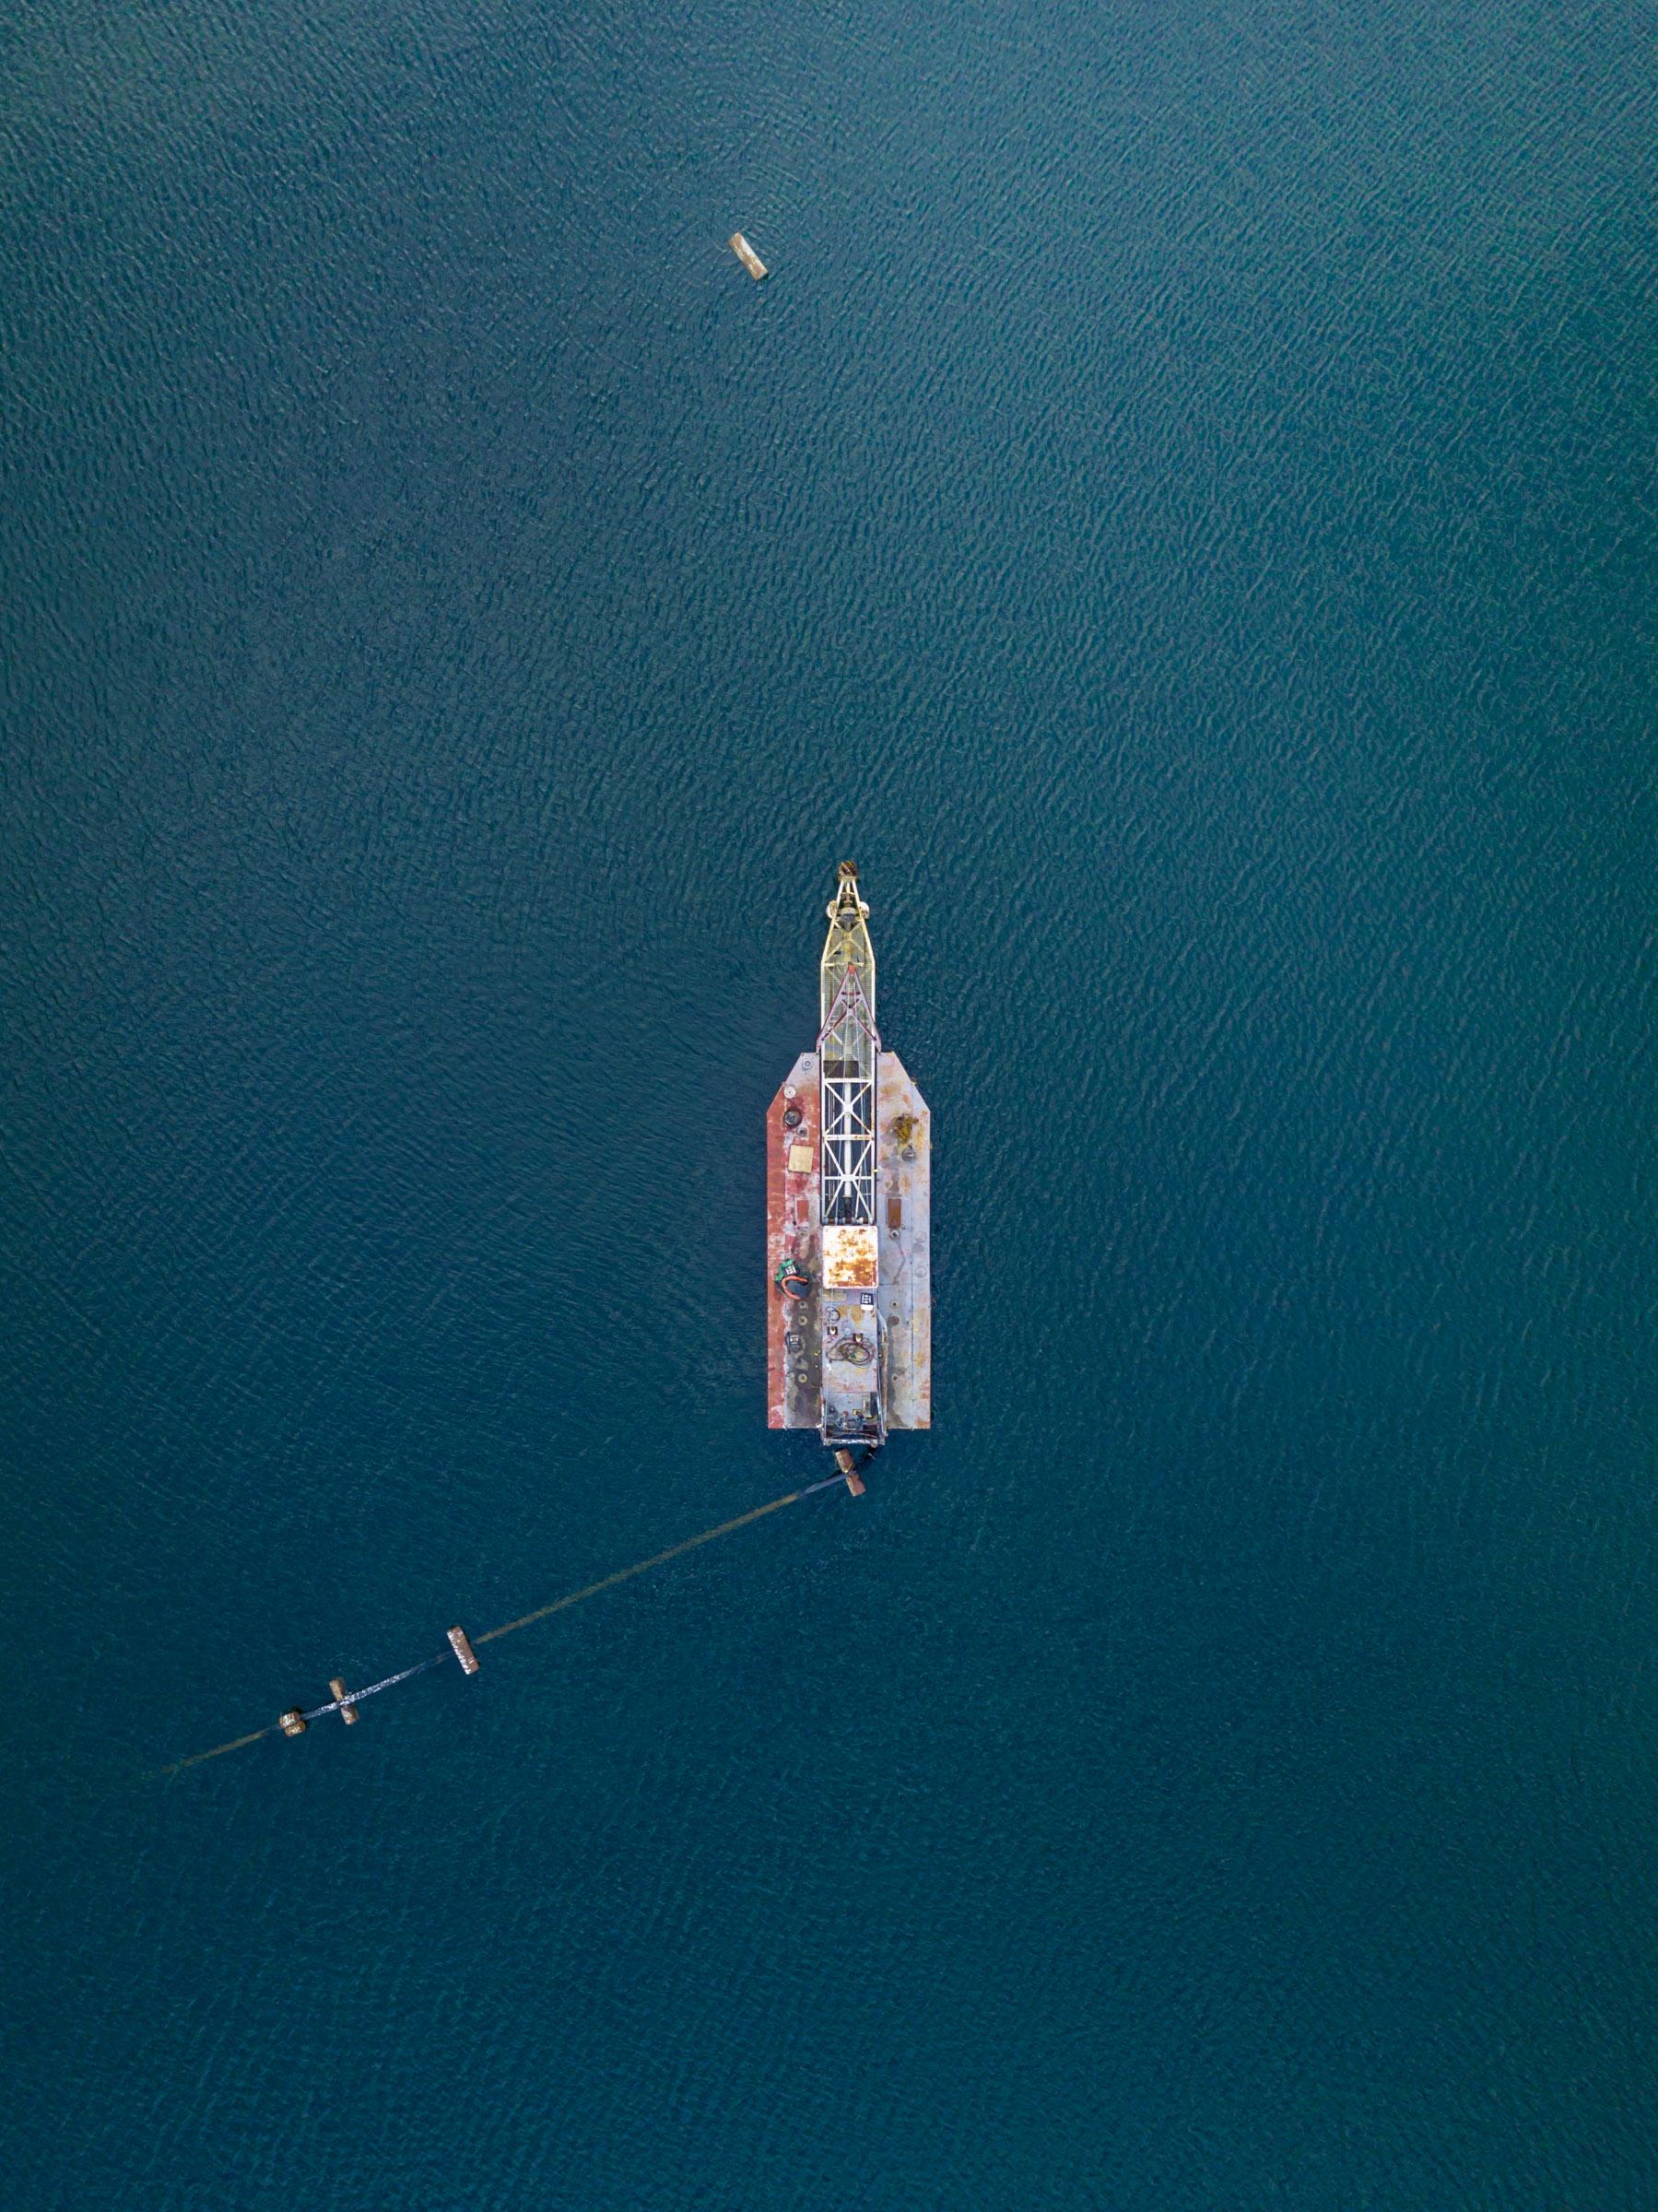 anchored_typoland_aerial.jpg